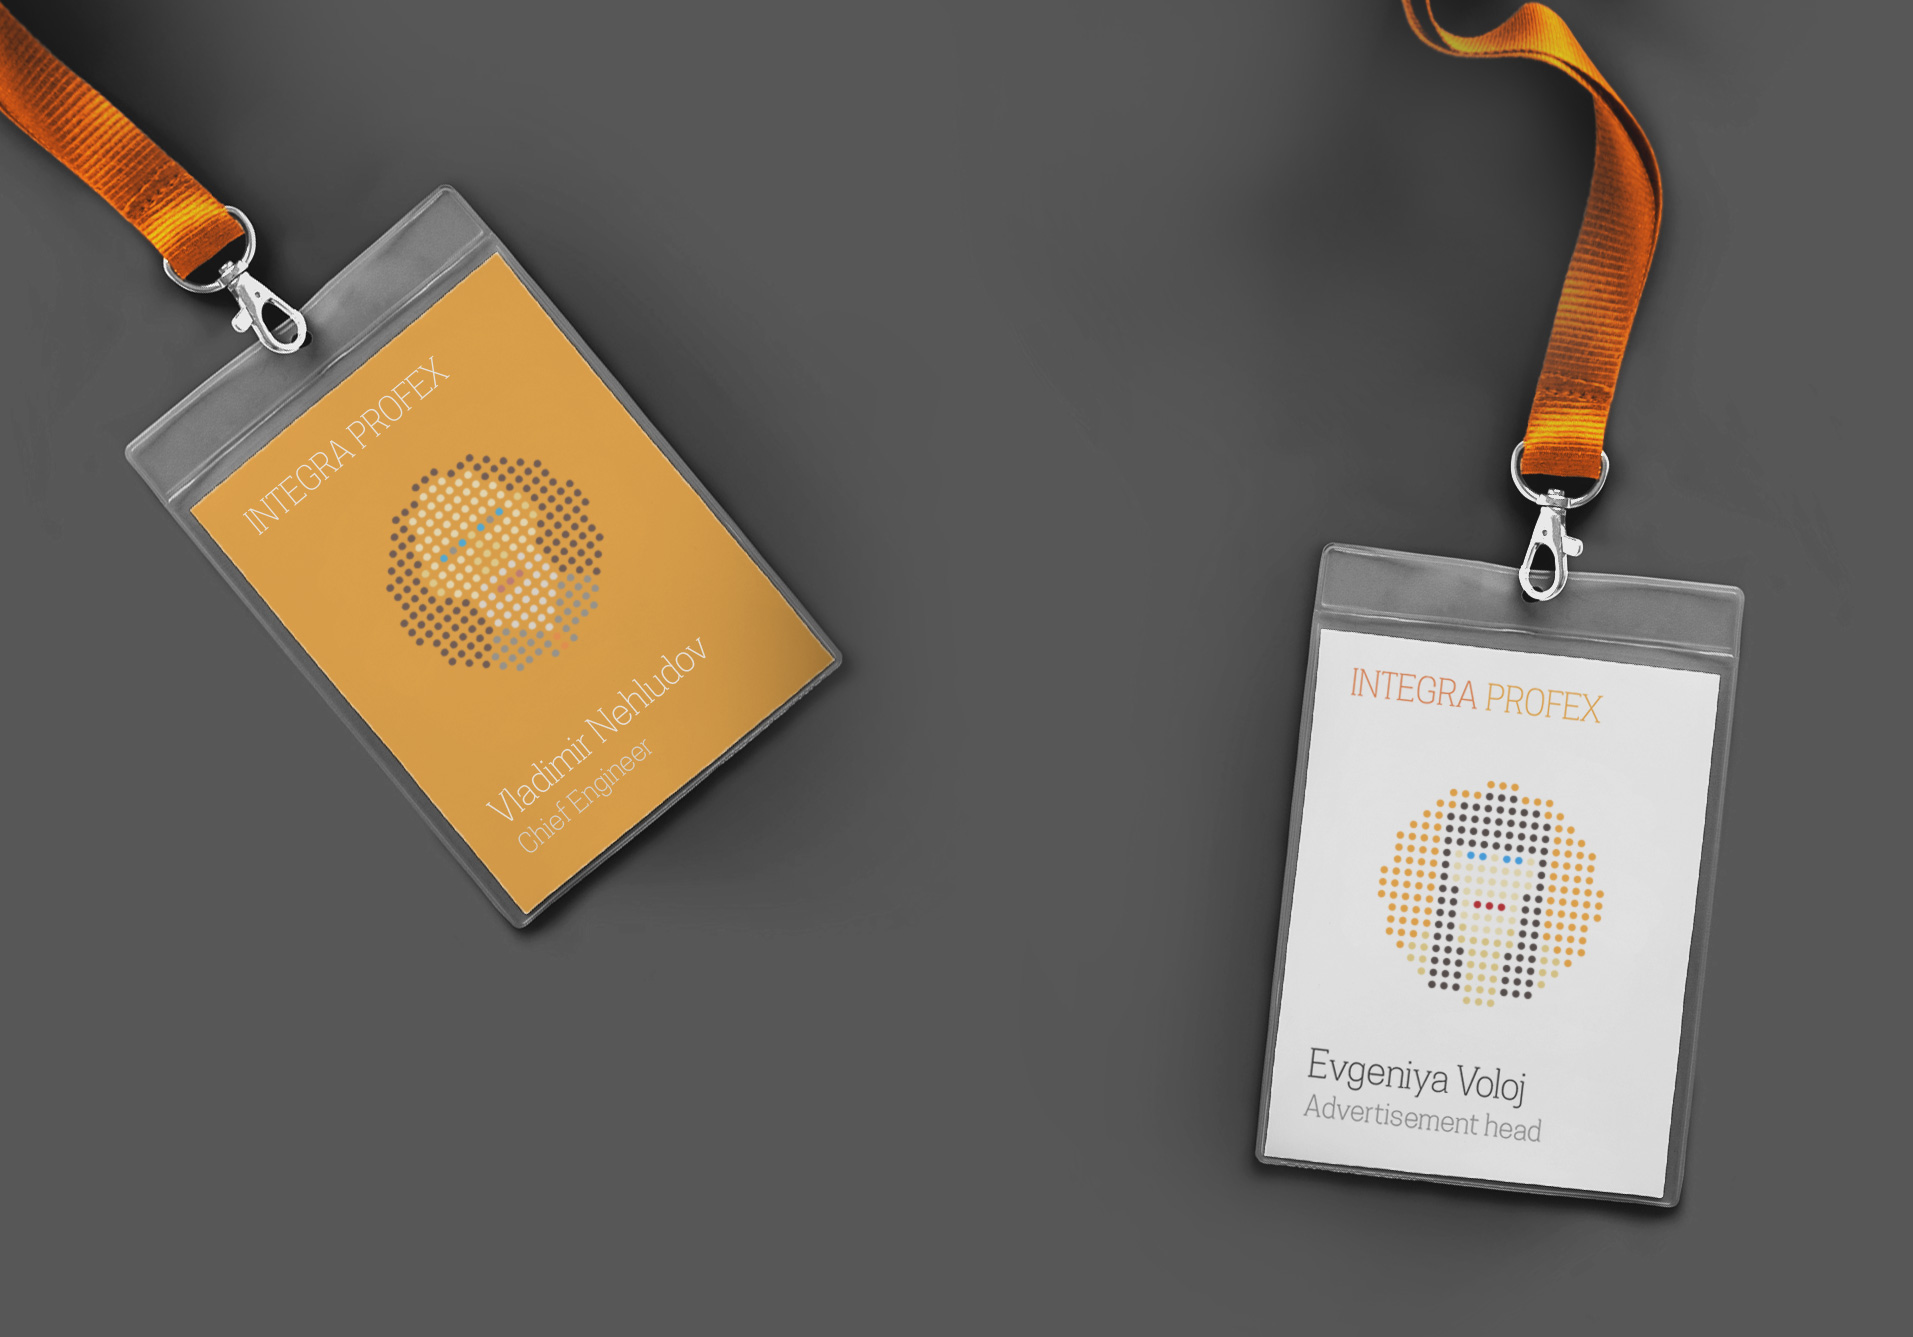 integra_badge